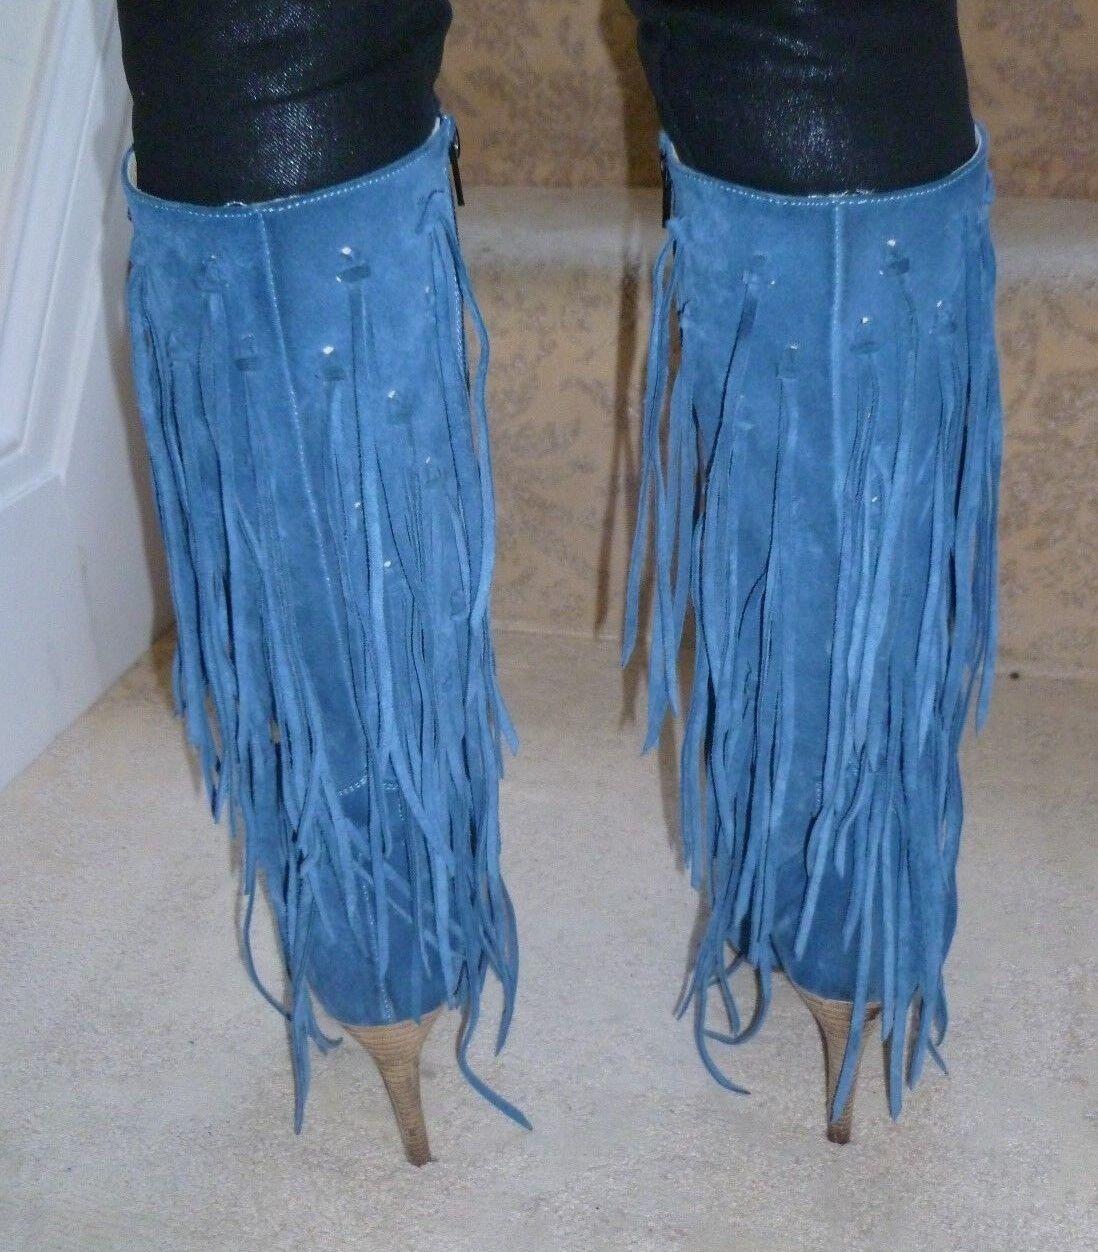 Fabulous Tasseled/Fringed Italian Blau Suede Tasseled/Fringed Fabulous Stiefel - Größe 4 f7077b